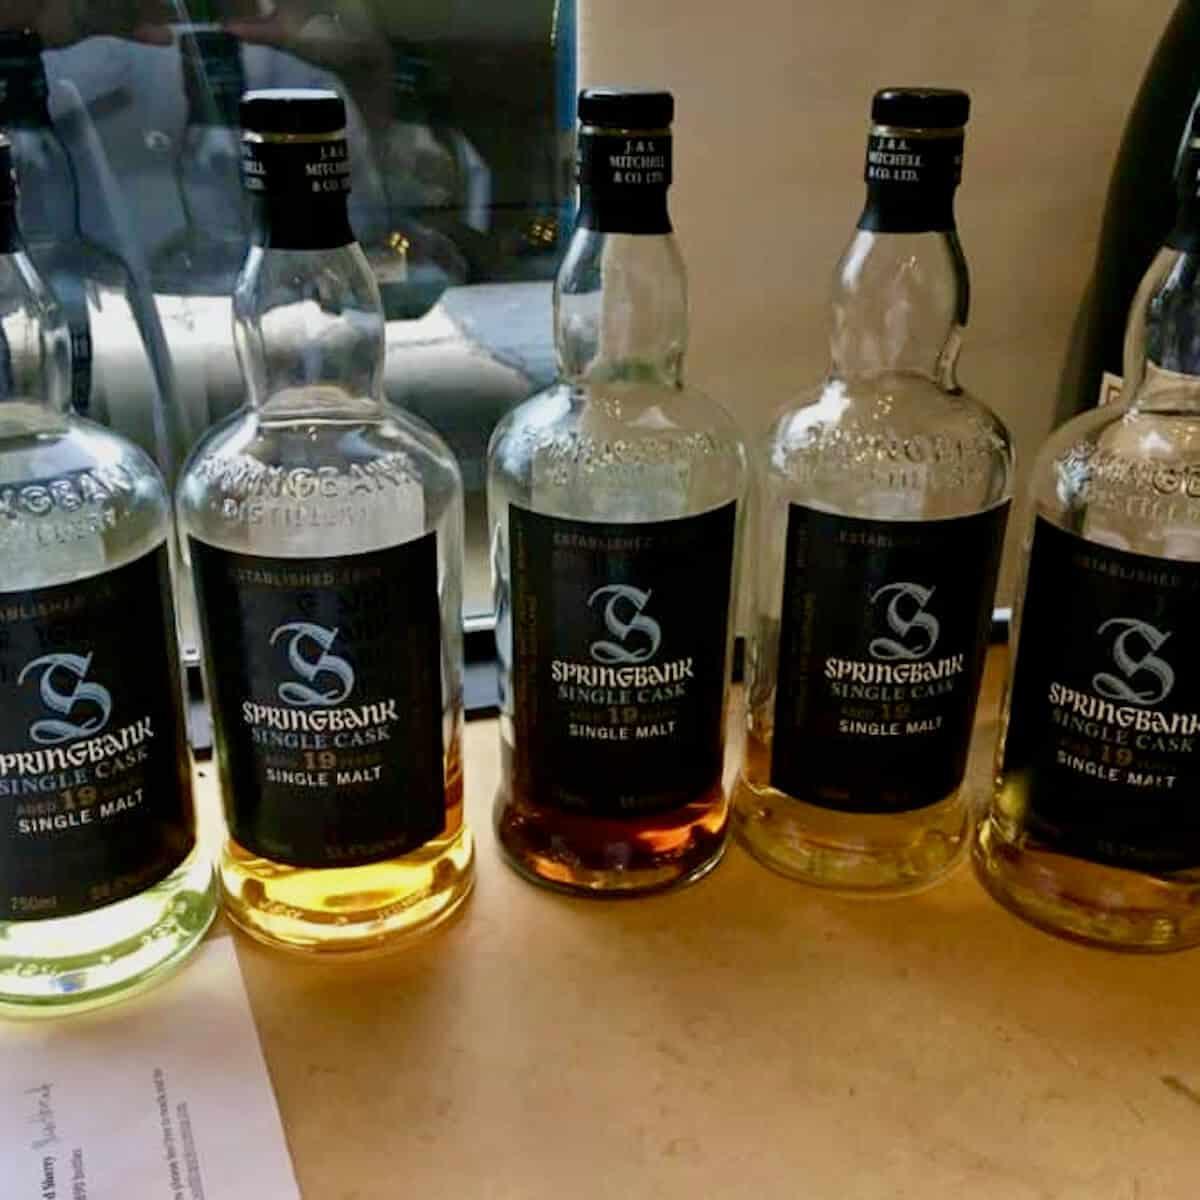 Springbank Single Malt Oak Exploration lineup bottles on a table.